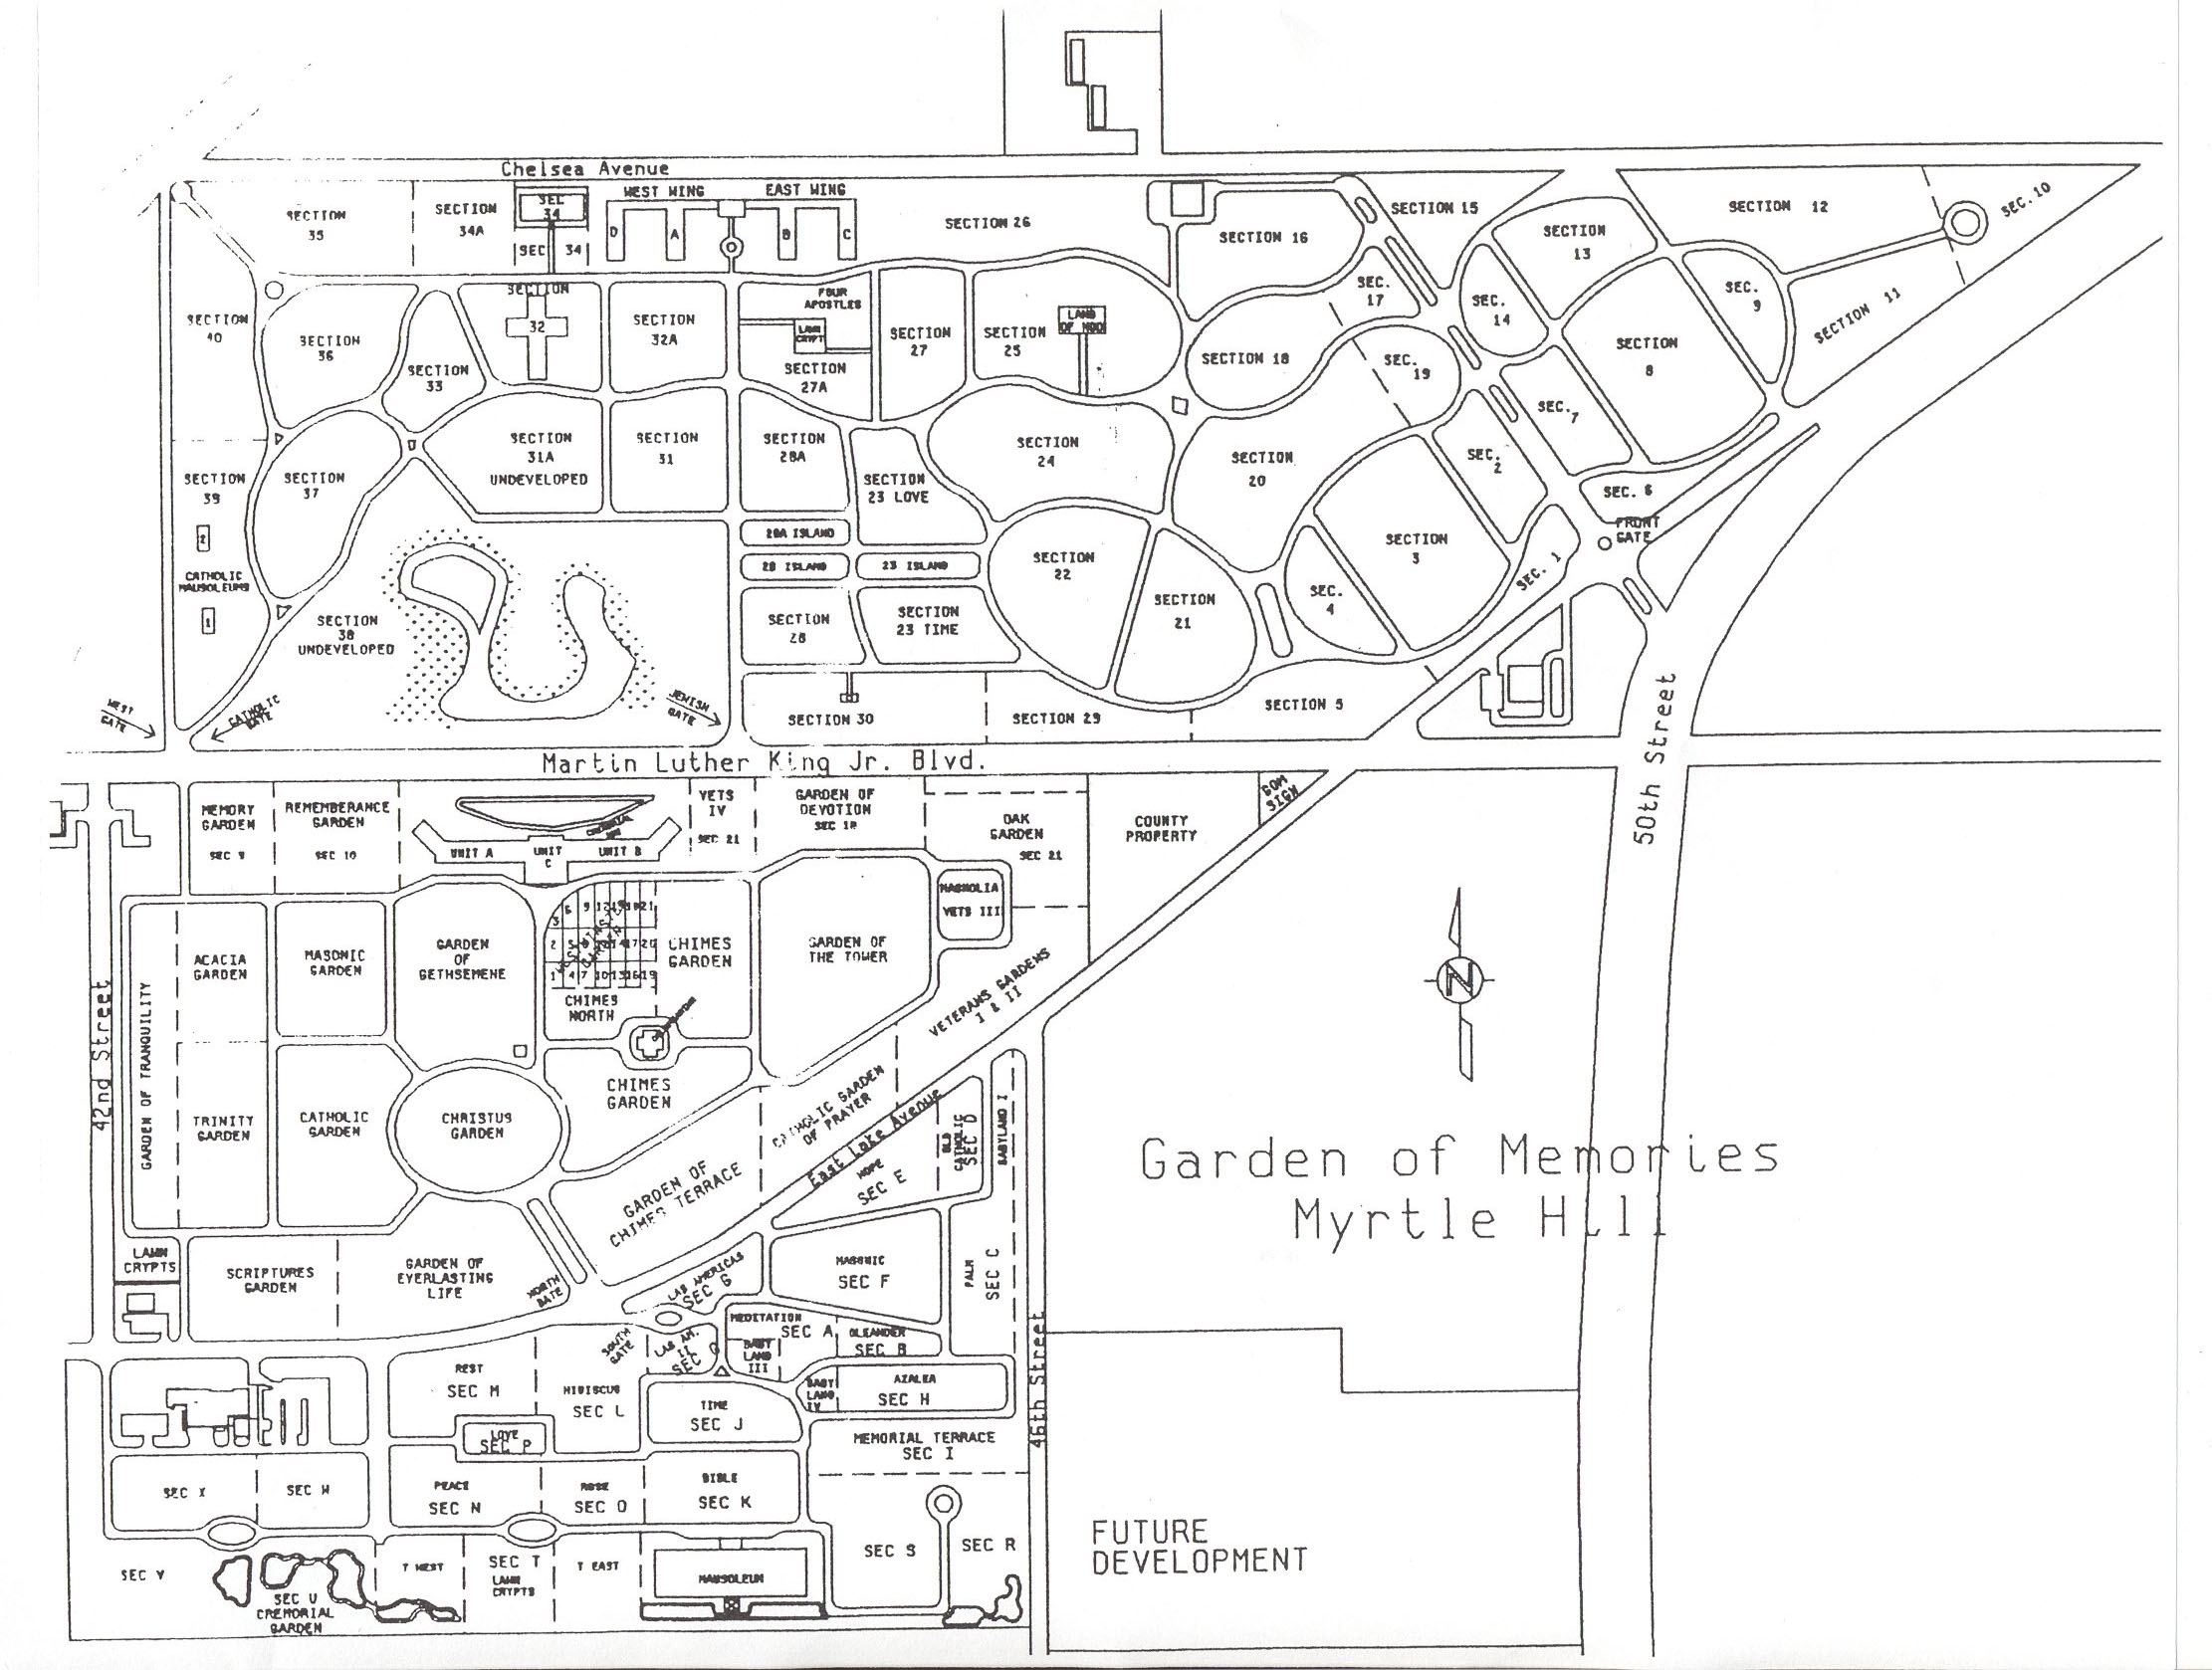 view original - Garden Of Memories Tampa